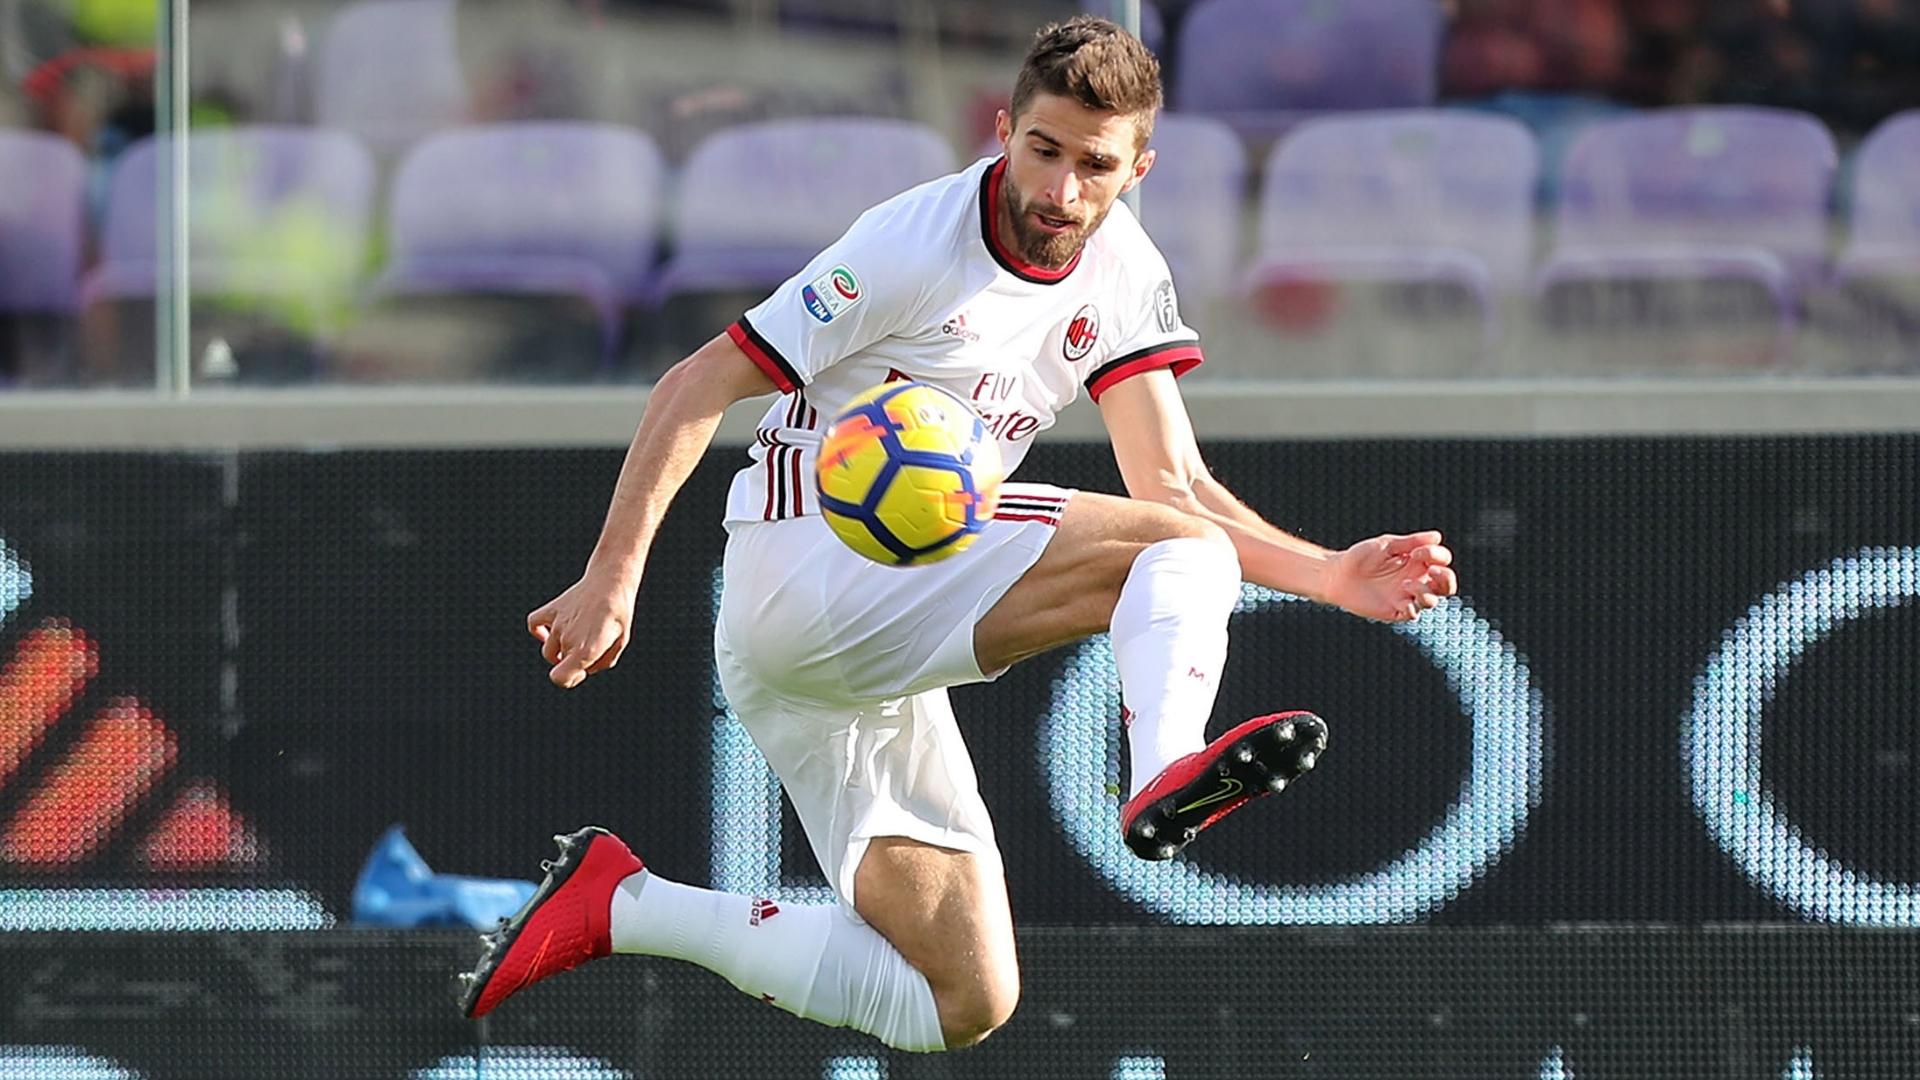 Toromania: Belotti è già decisivo... per il Milan